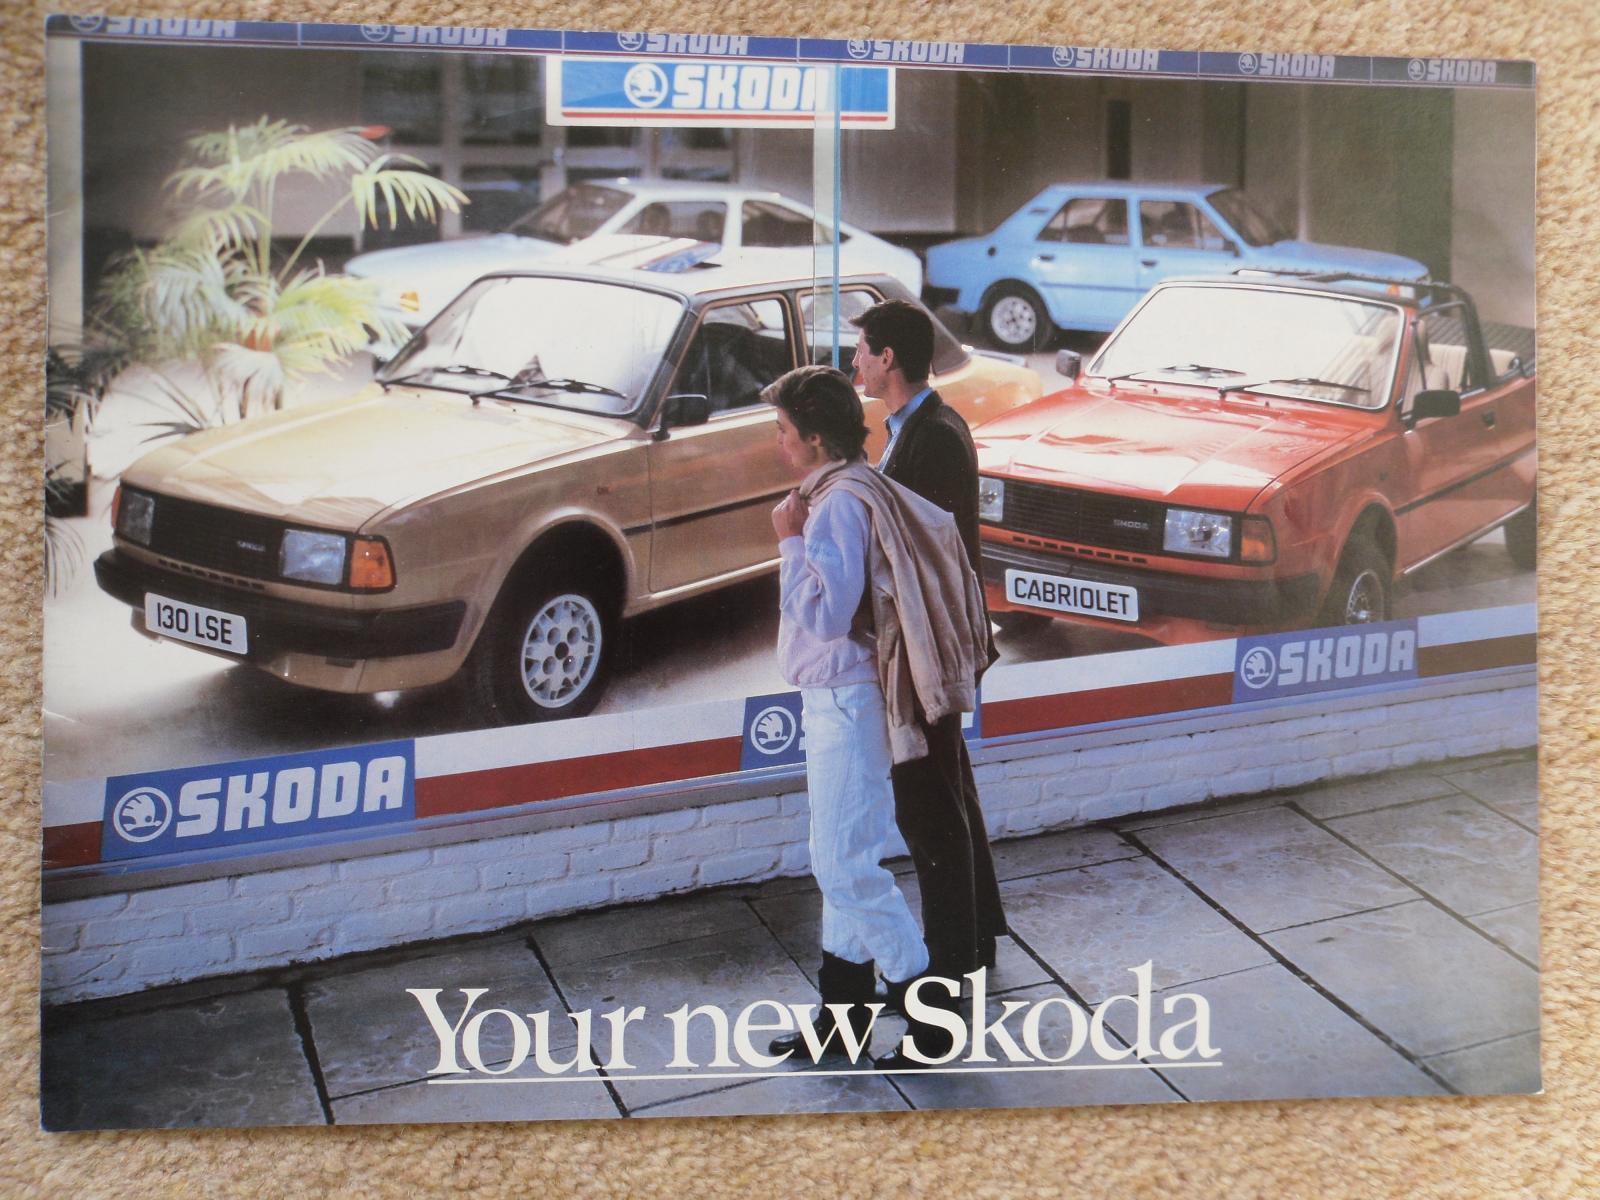 Skoda 1986 001.JPG